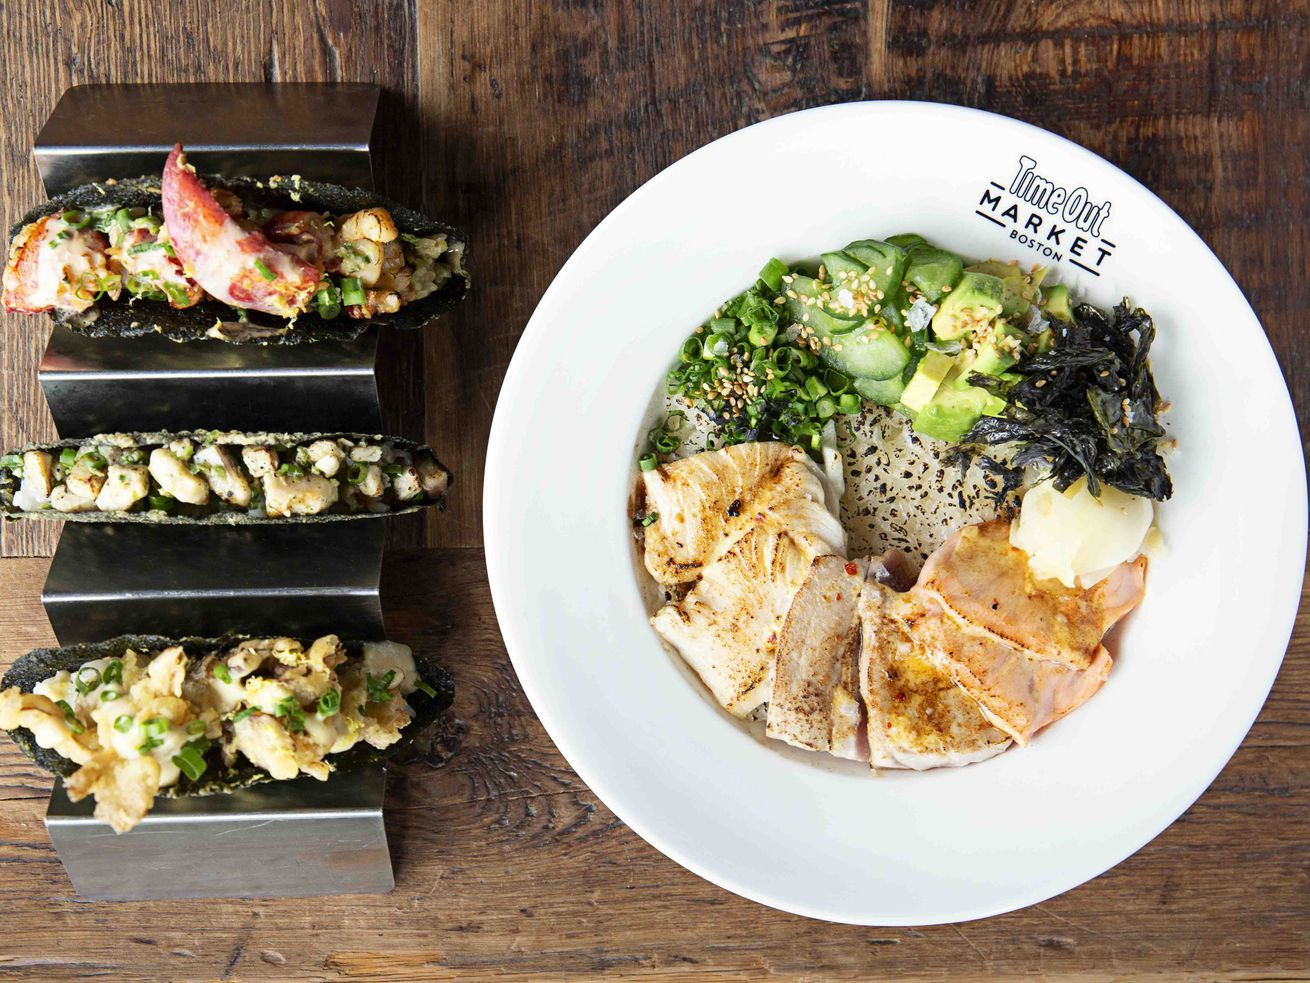 Crispy Nori Sushi Tacos Take Over O Ya For Now Alongside Fancy Booze Buffet Food Nori Sushi Hispanic Food